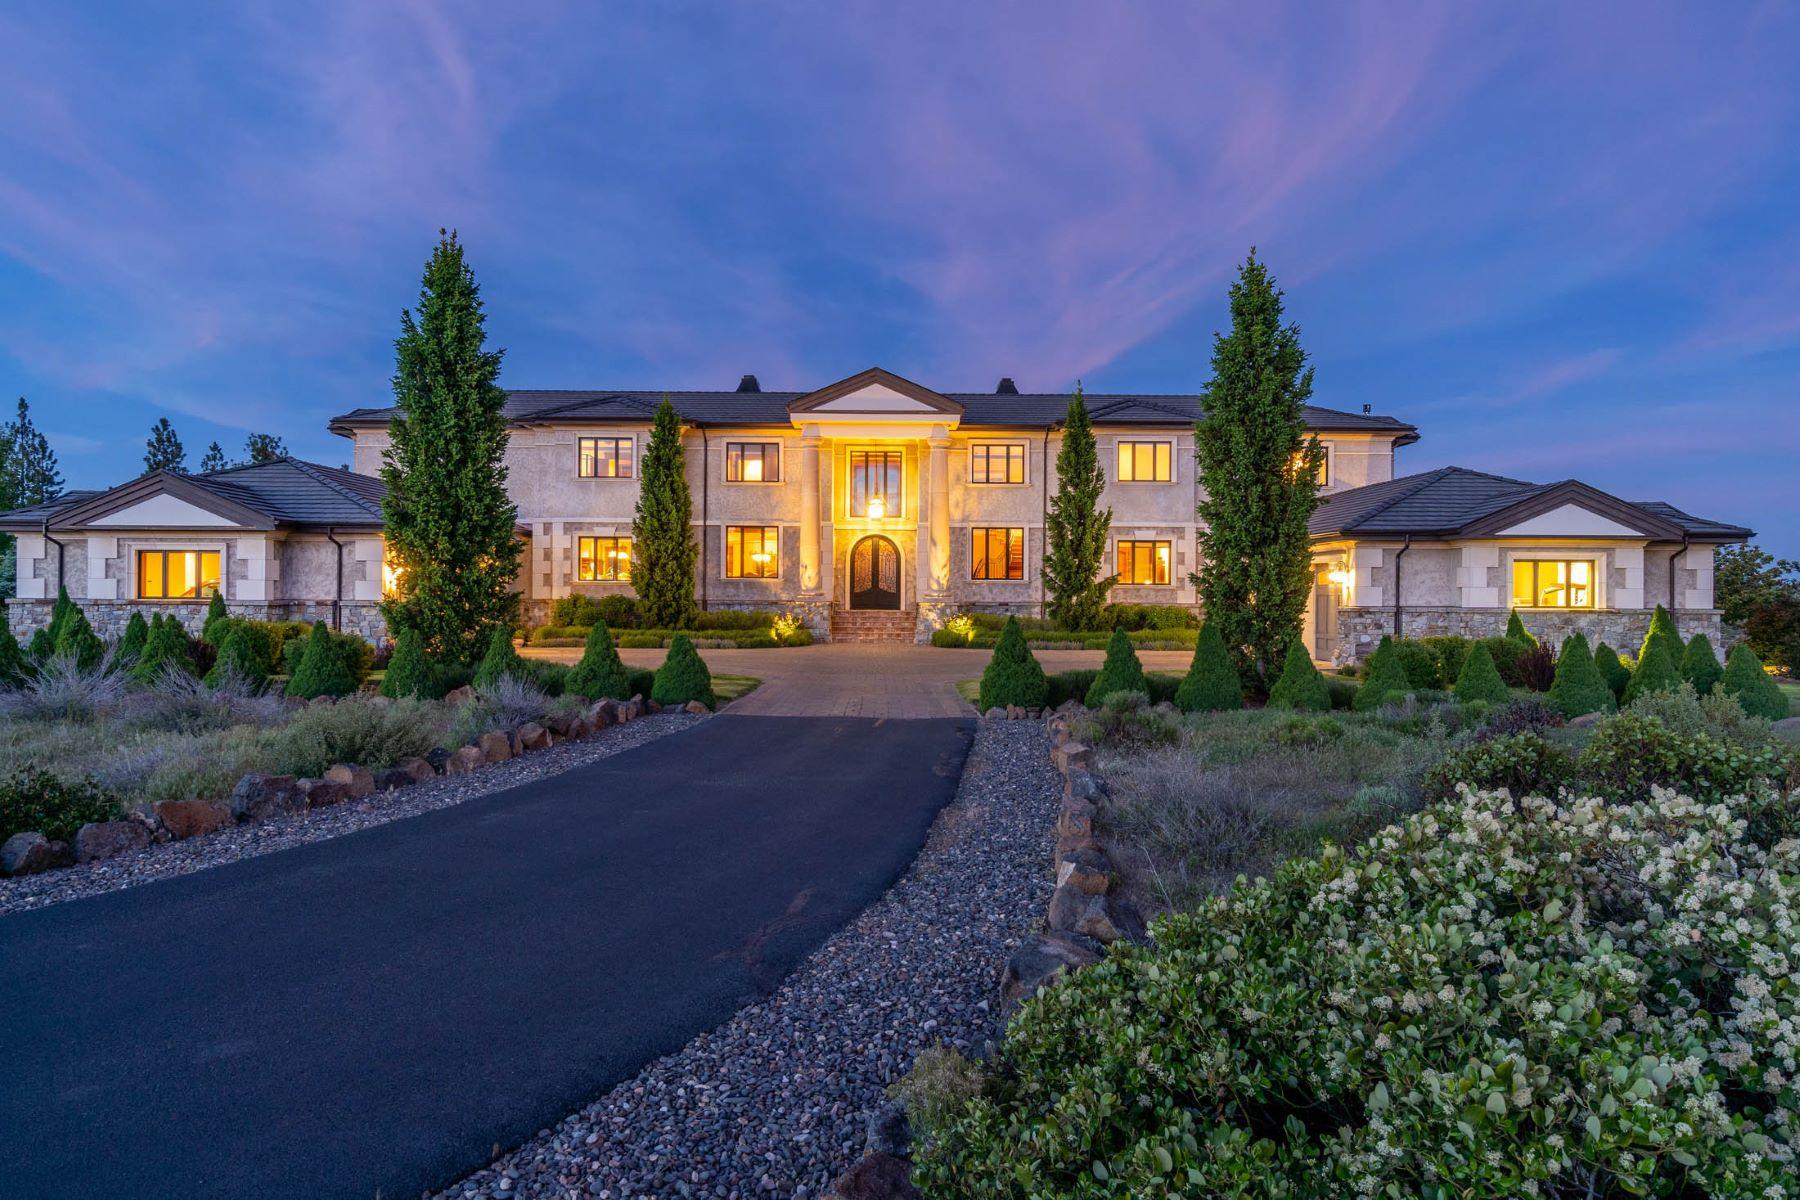 Other Residential Homes για την Πώληση στο 60990 Bachelor View Road Bend, OR 97702 Bend, Ορεγκον 97702 Ηνωμένες Πολιτείες